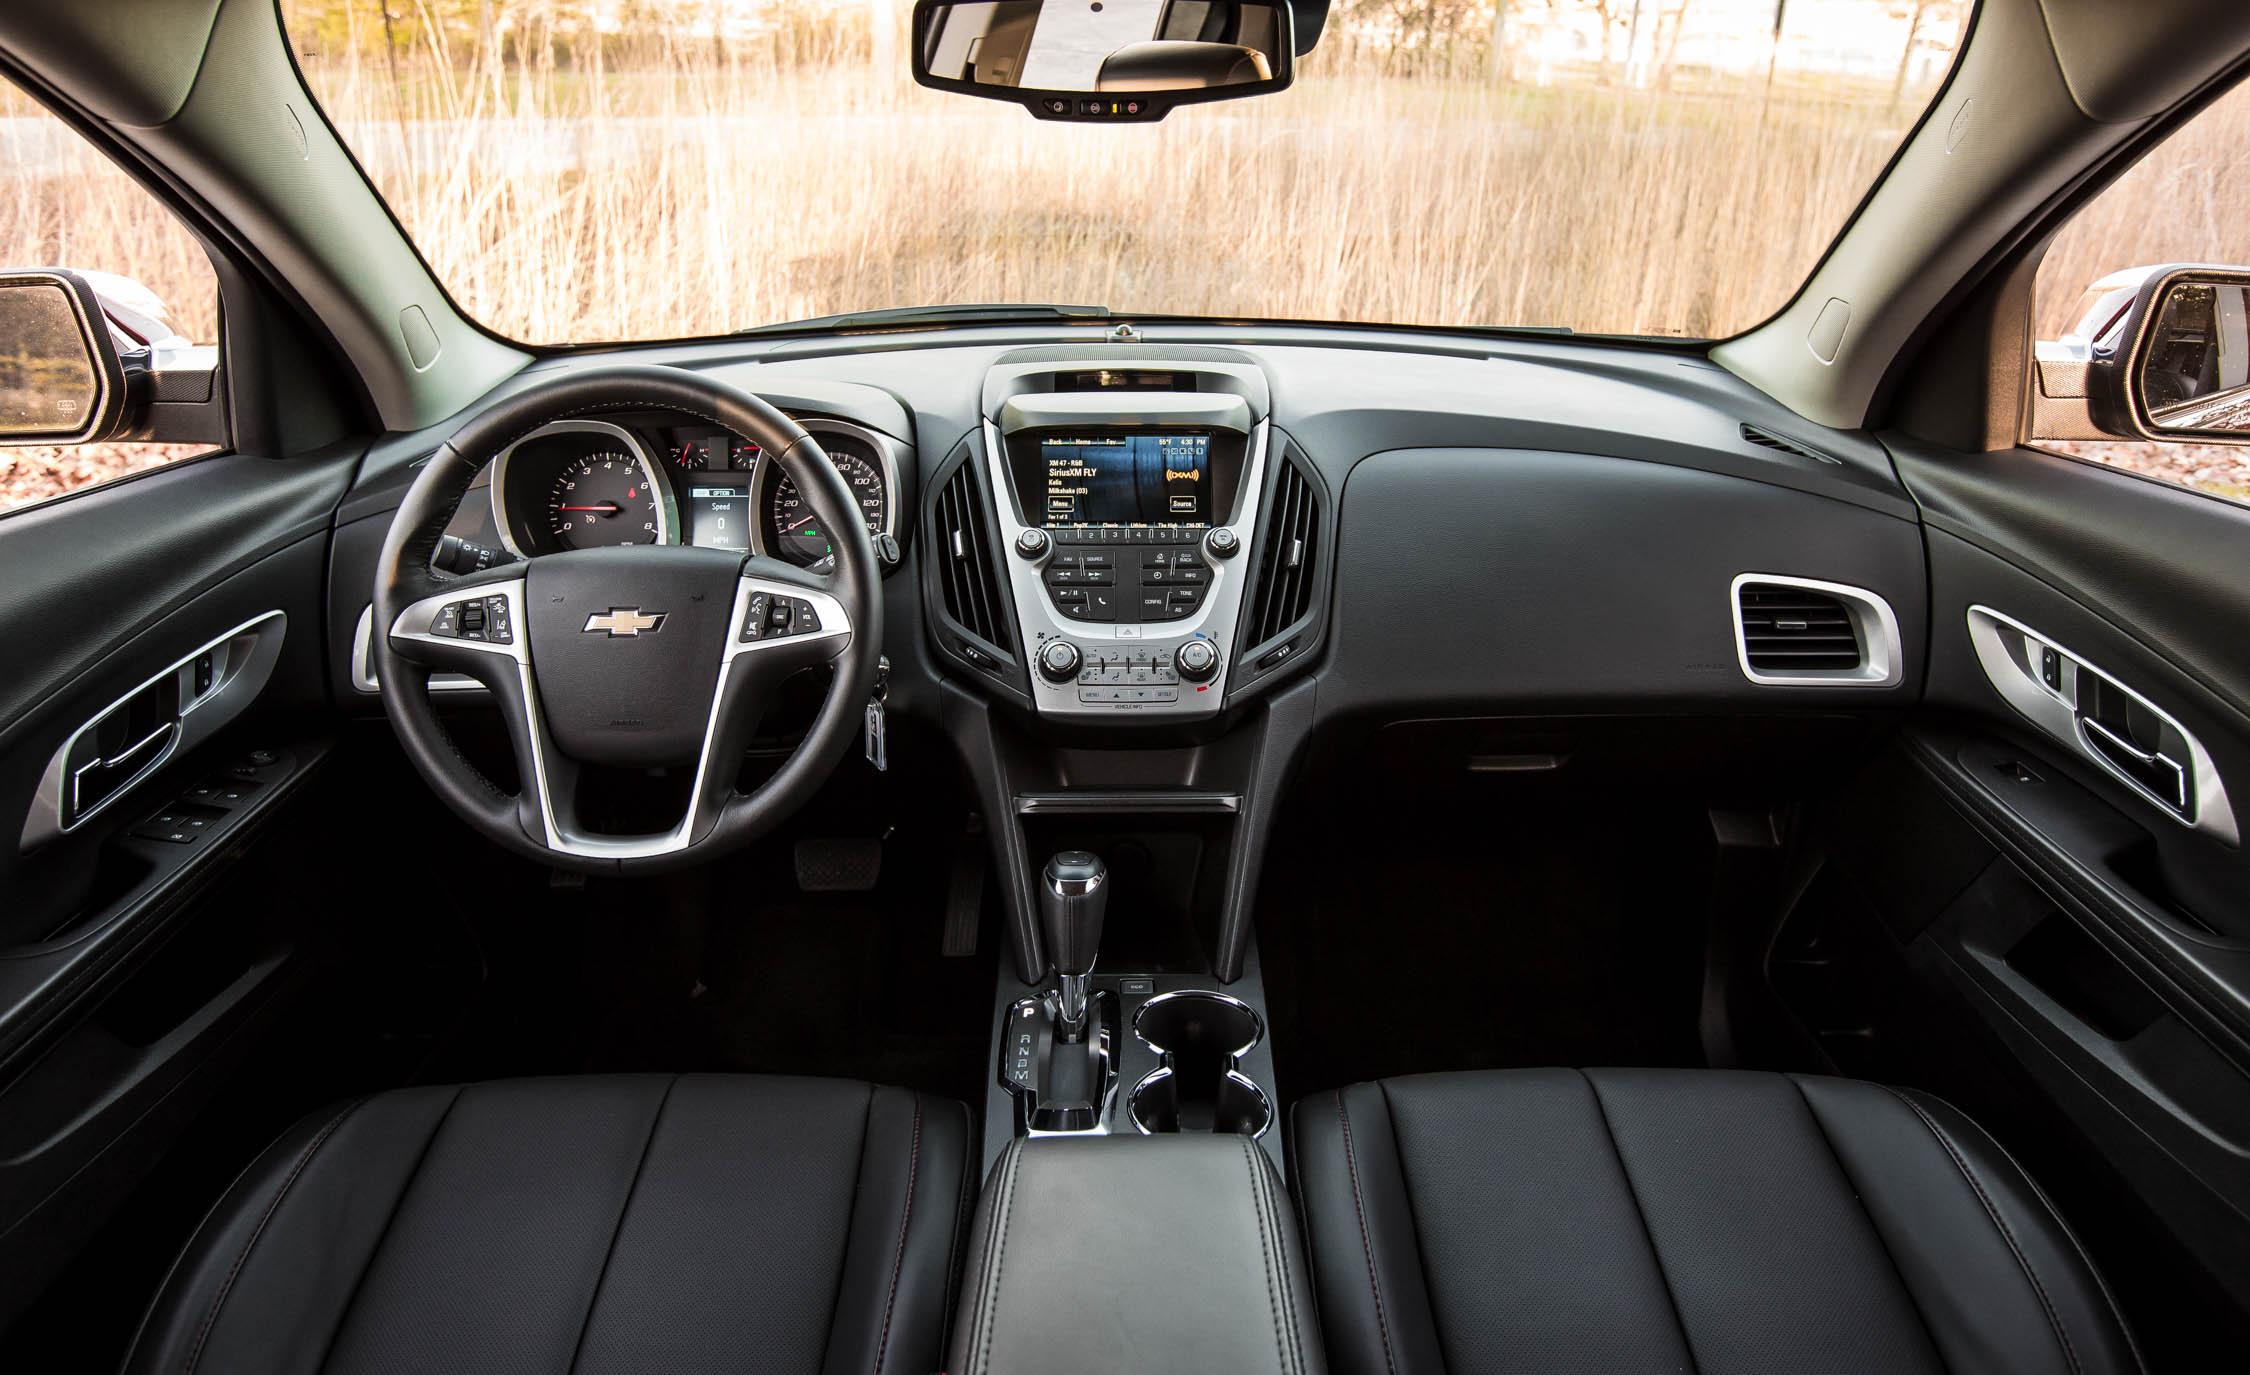 2016 Chevrolet Equinox LTZ (Photo 24 of 25)